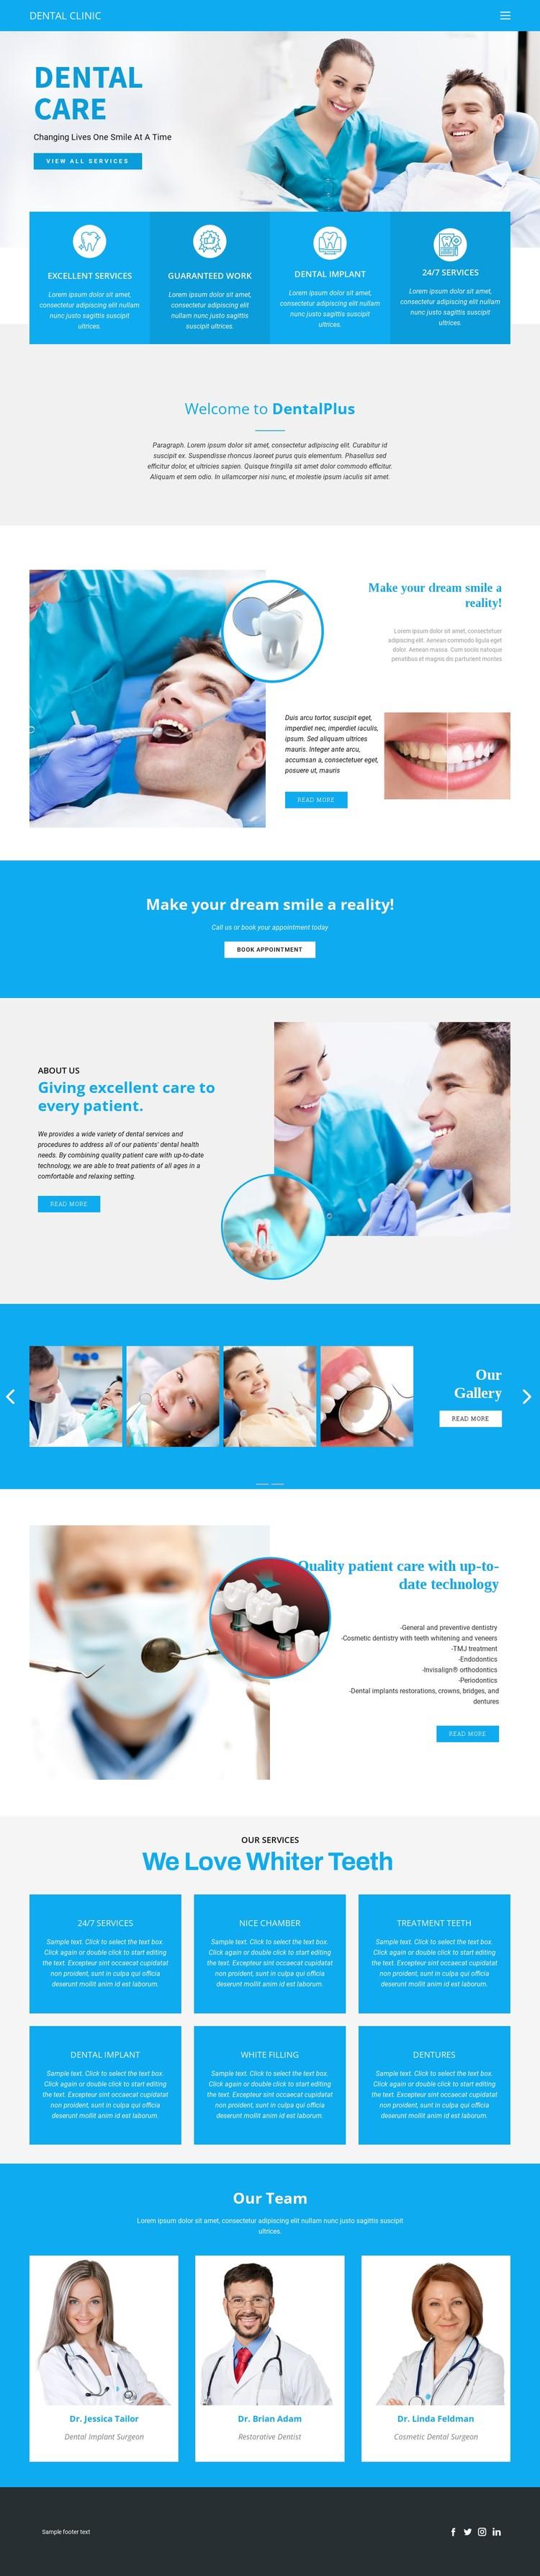 Dental care and medicine Static Site Generator